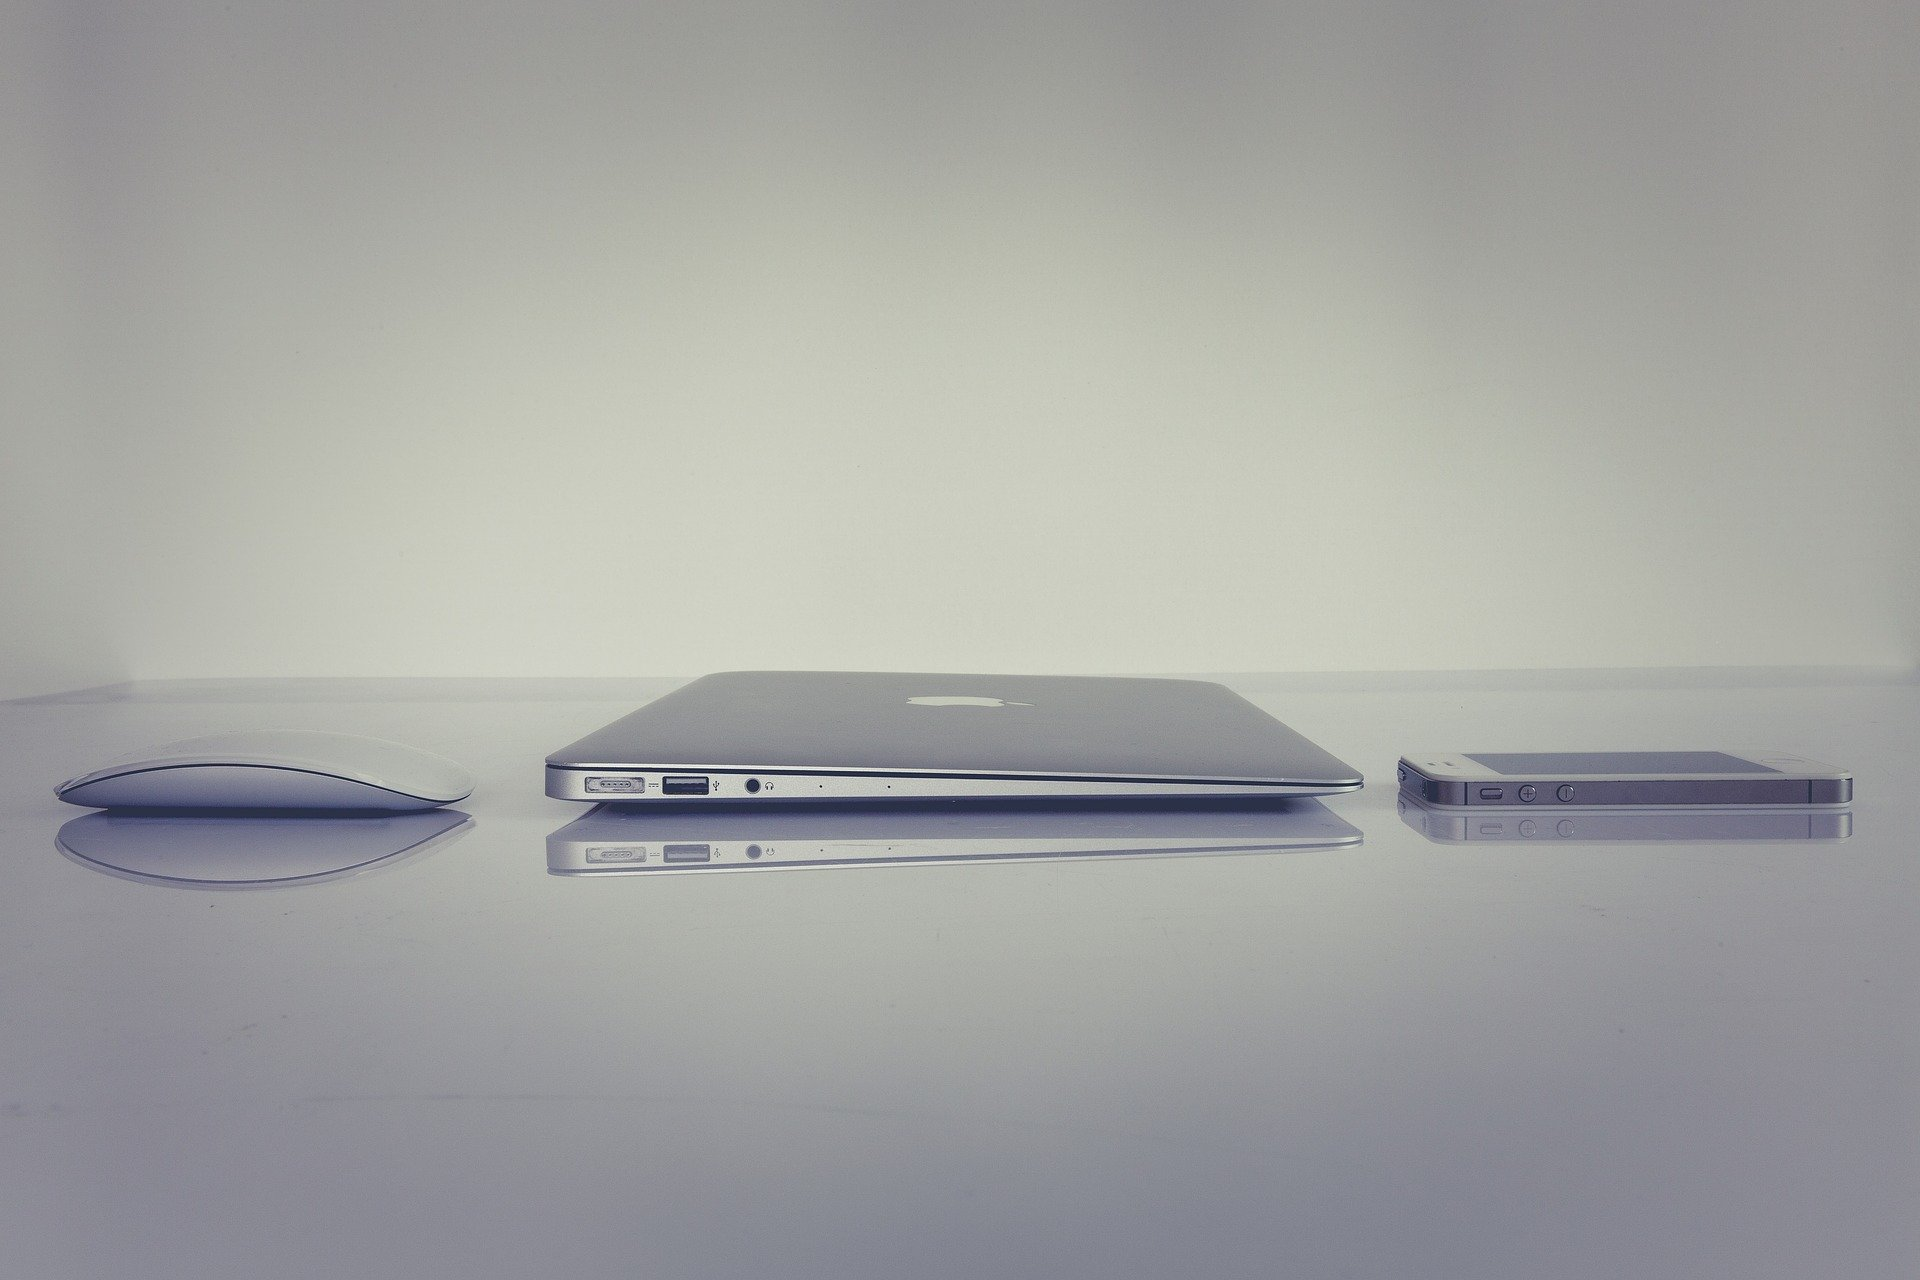 《Apple公式サイト》はどのポイントサイトがお得?最高還元率の推移も分かる!